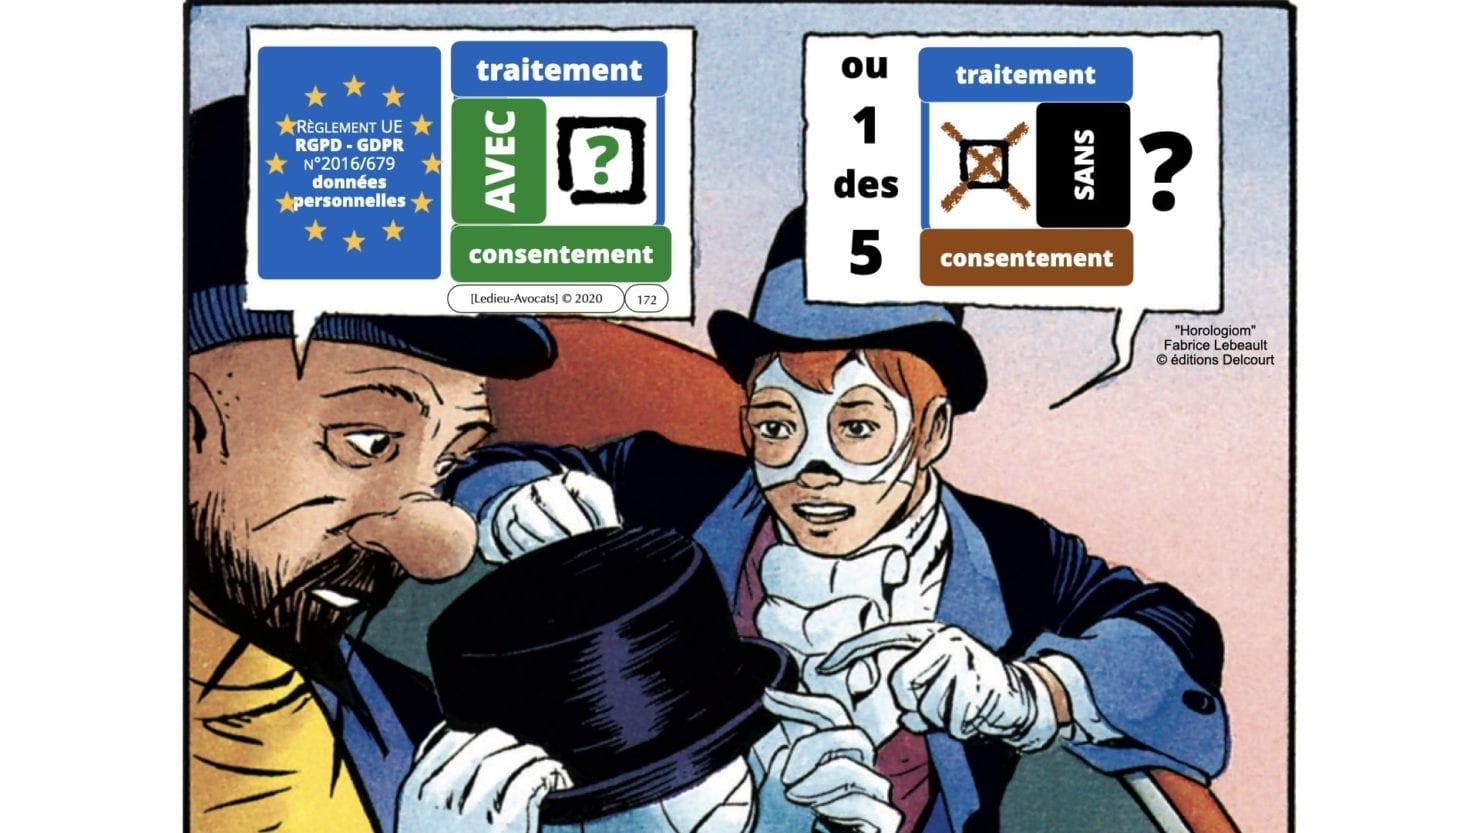 RGPD e-Privacy principes actualité jurisprudence ©Ledieu-Avocats 25-06-2021.172